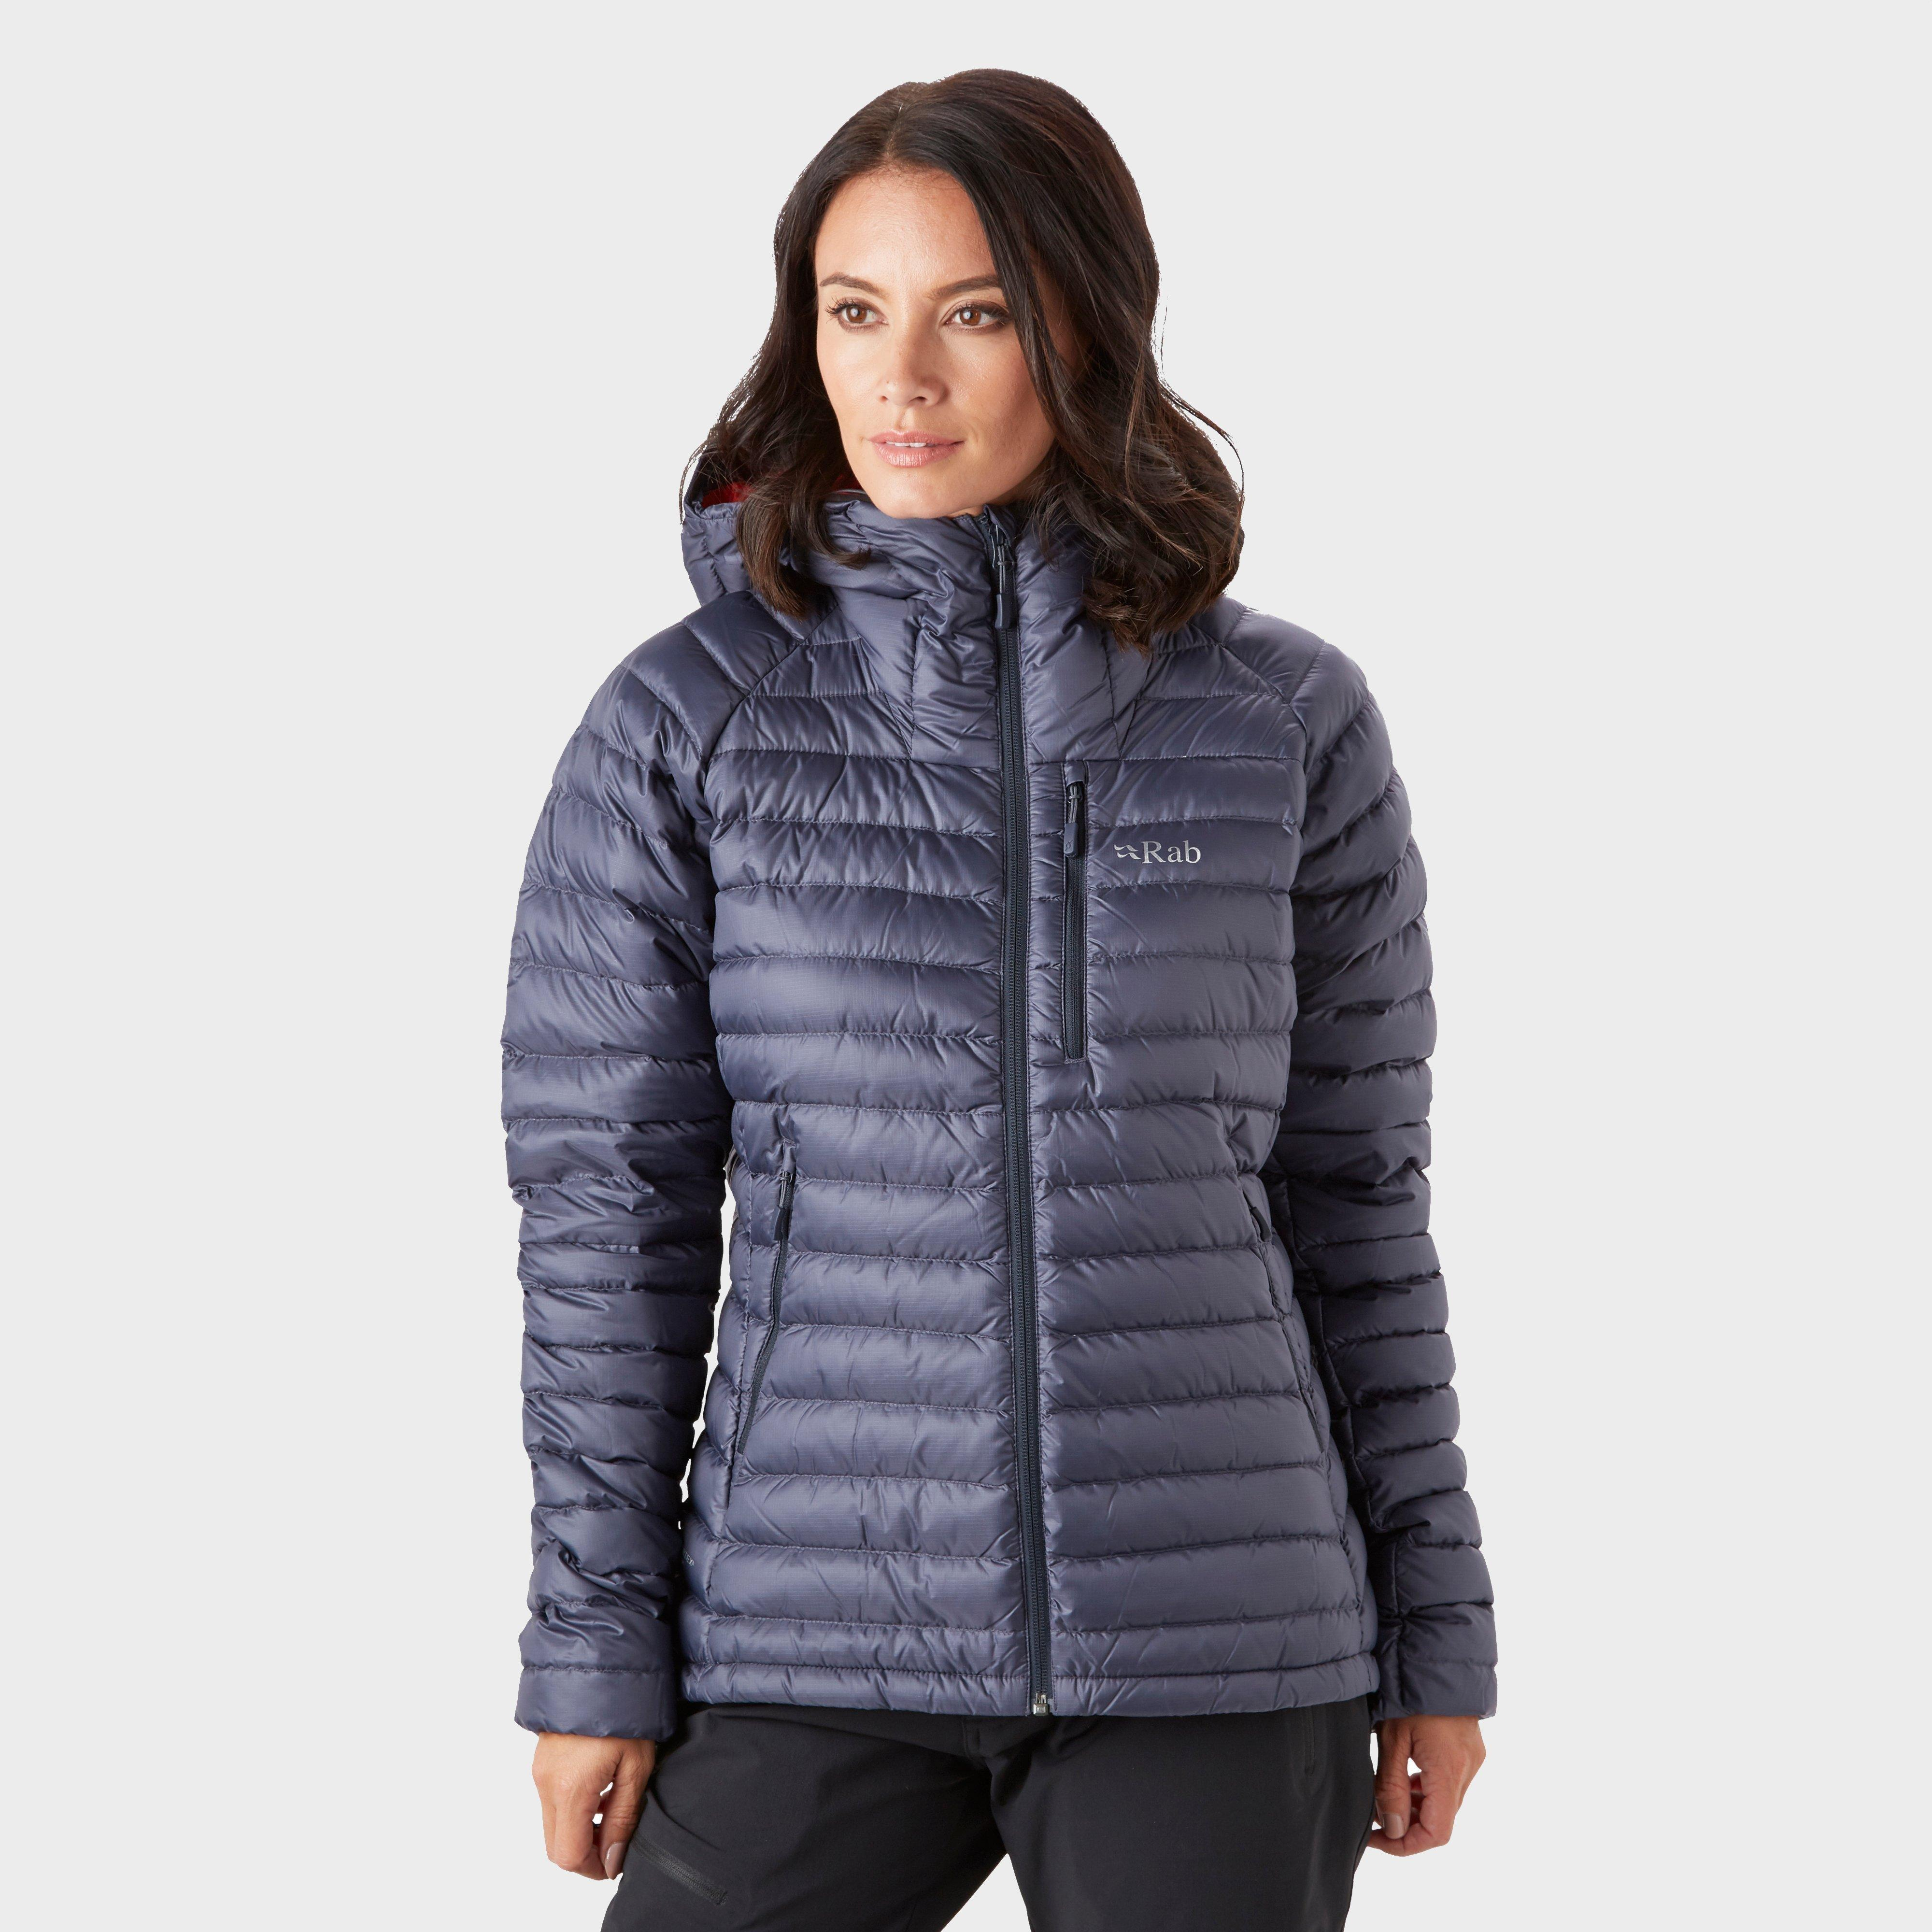 Rab Rab Womens Microlight Alpine Jacket - N/A, N/A